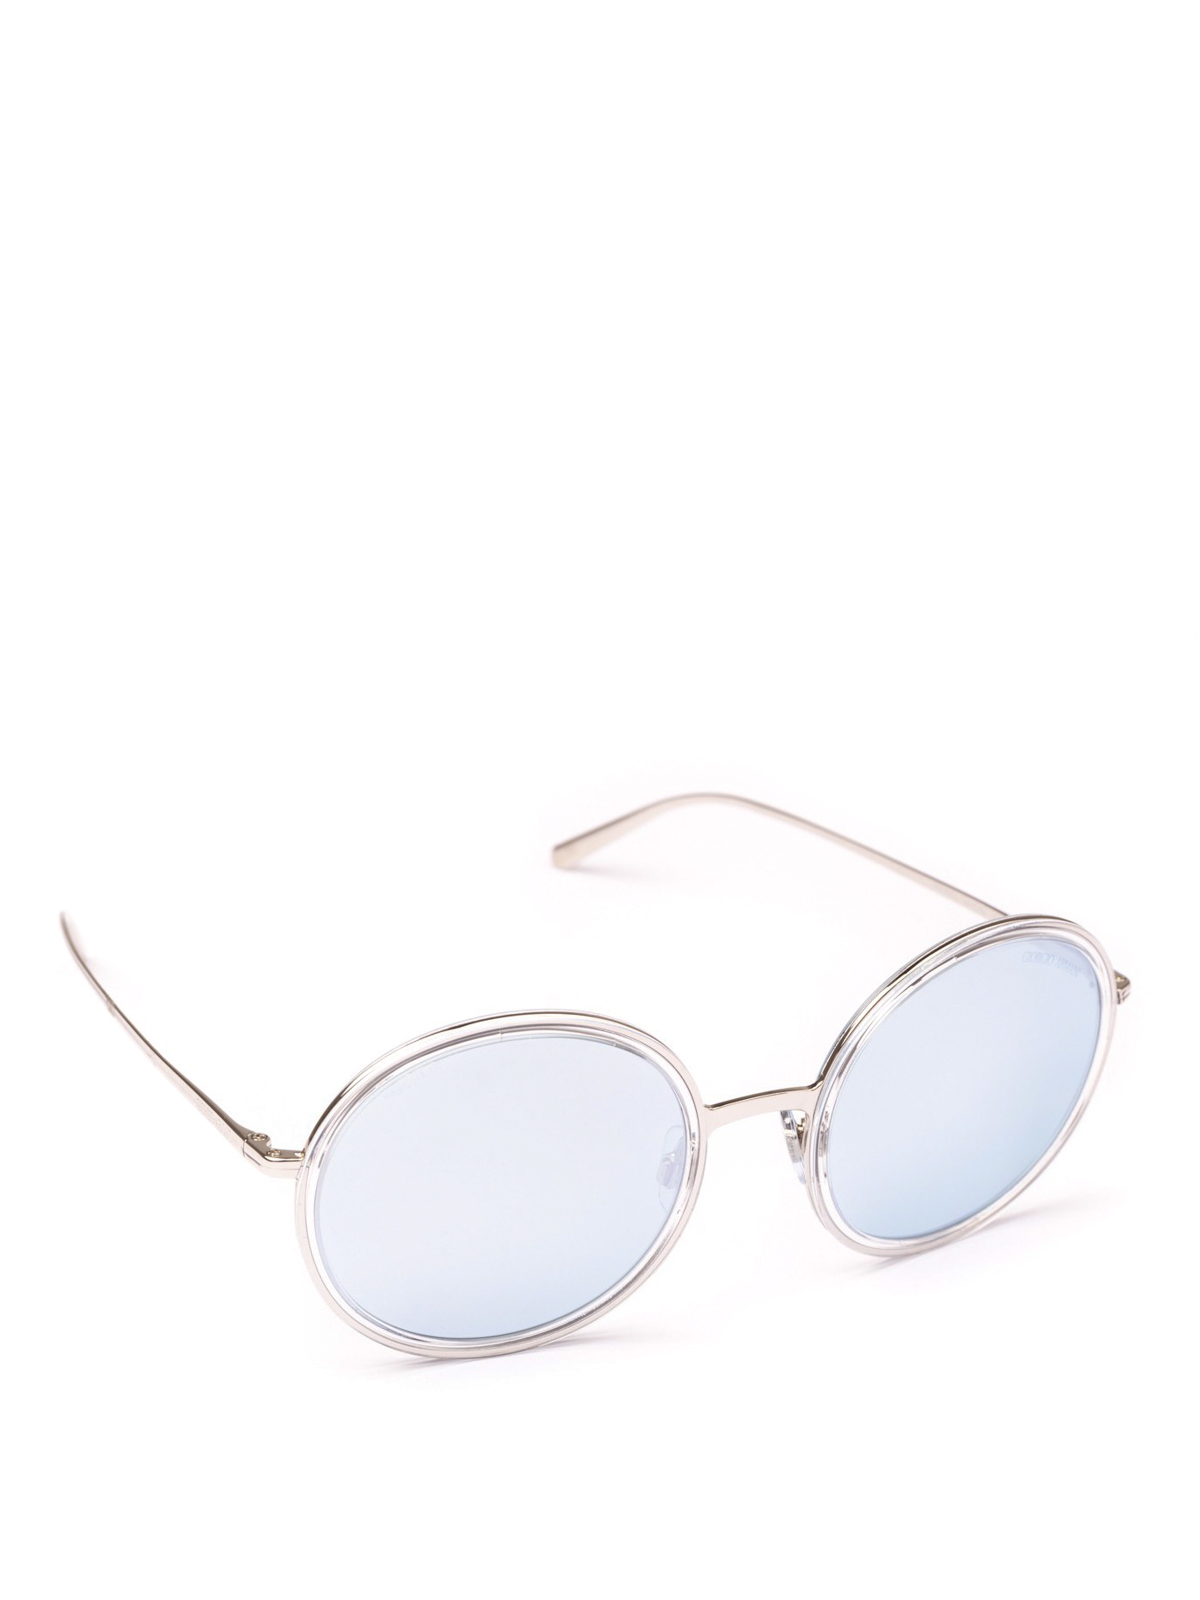 916ffc0ec6c1 GIORGIO ARMANI  sunglasses - Blue mirror white lens round sunglasses